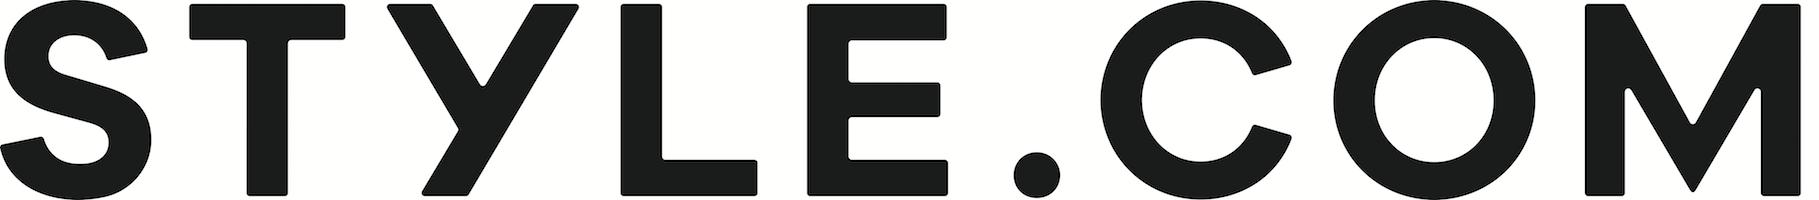 style-dot-com-logo.png